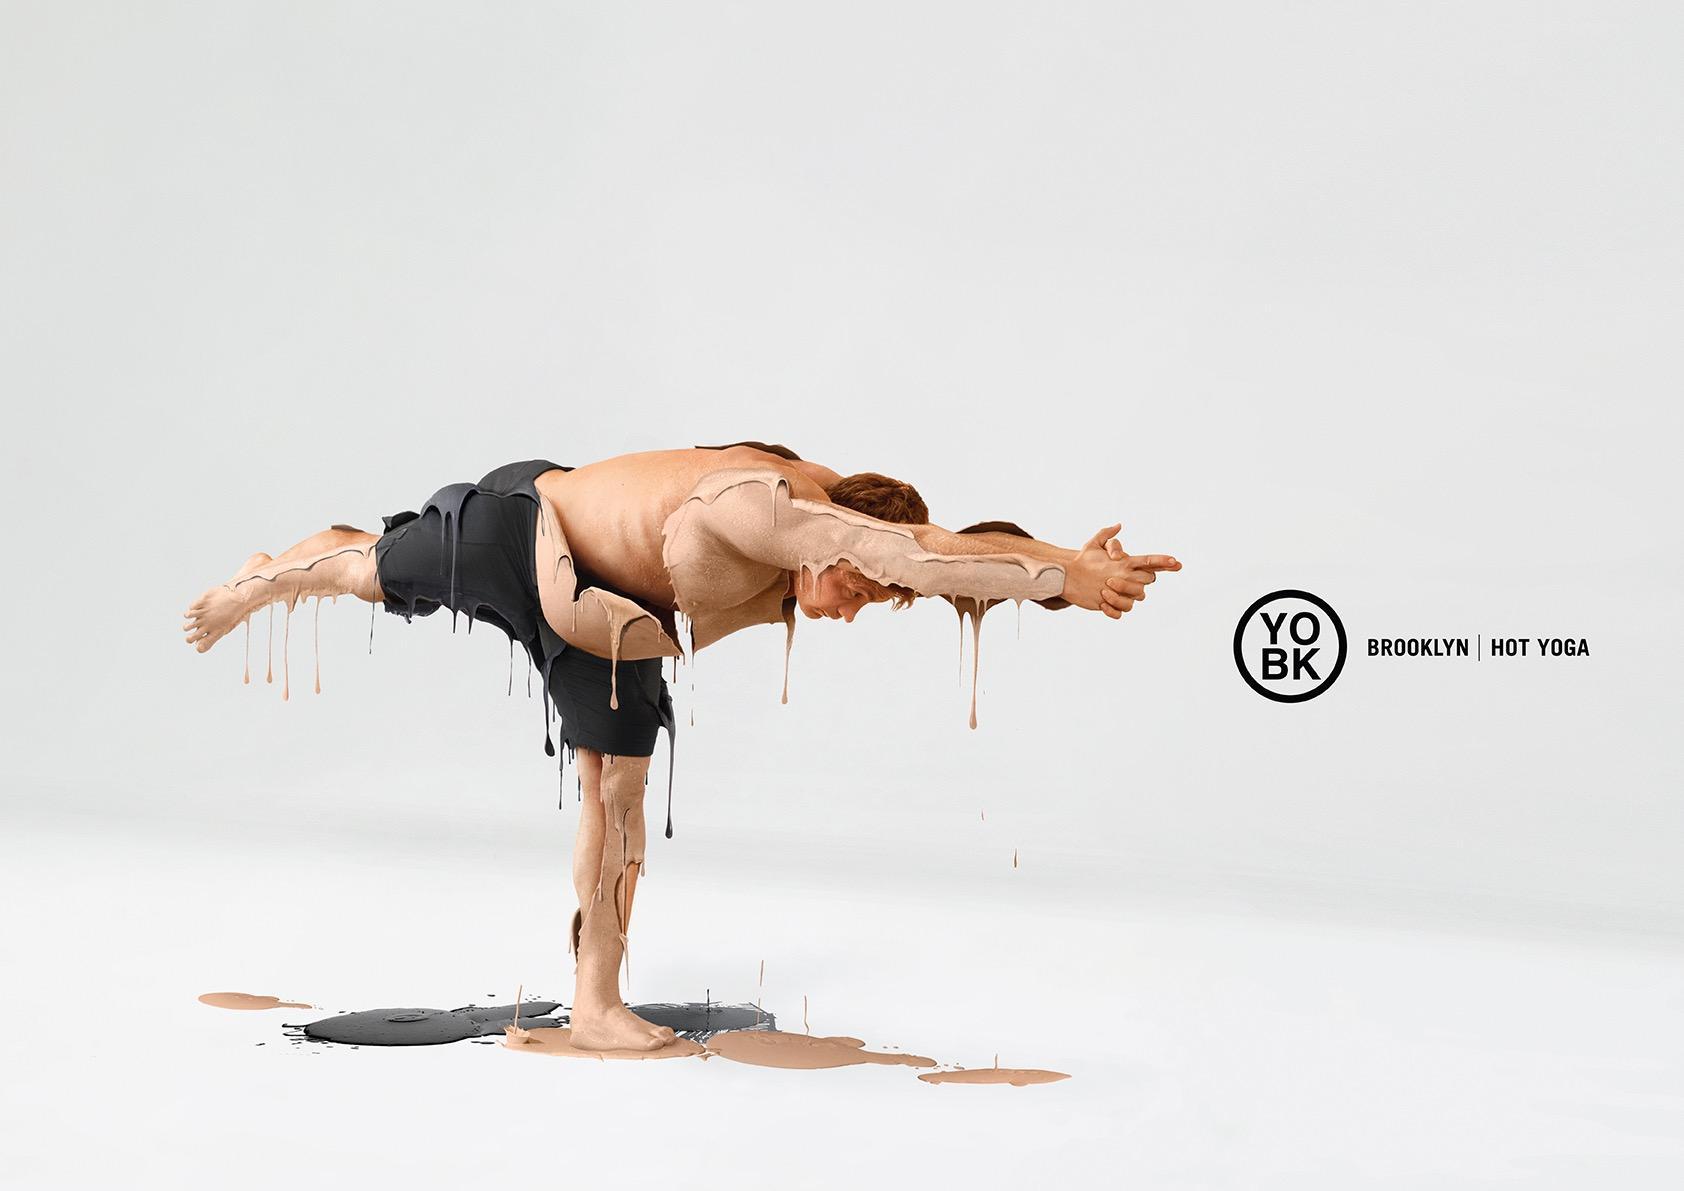 YO BK Yoga Studio Print Ad - Hot yoga, 3